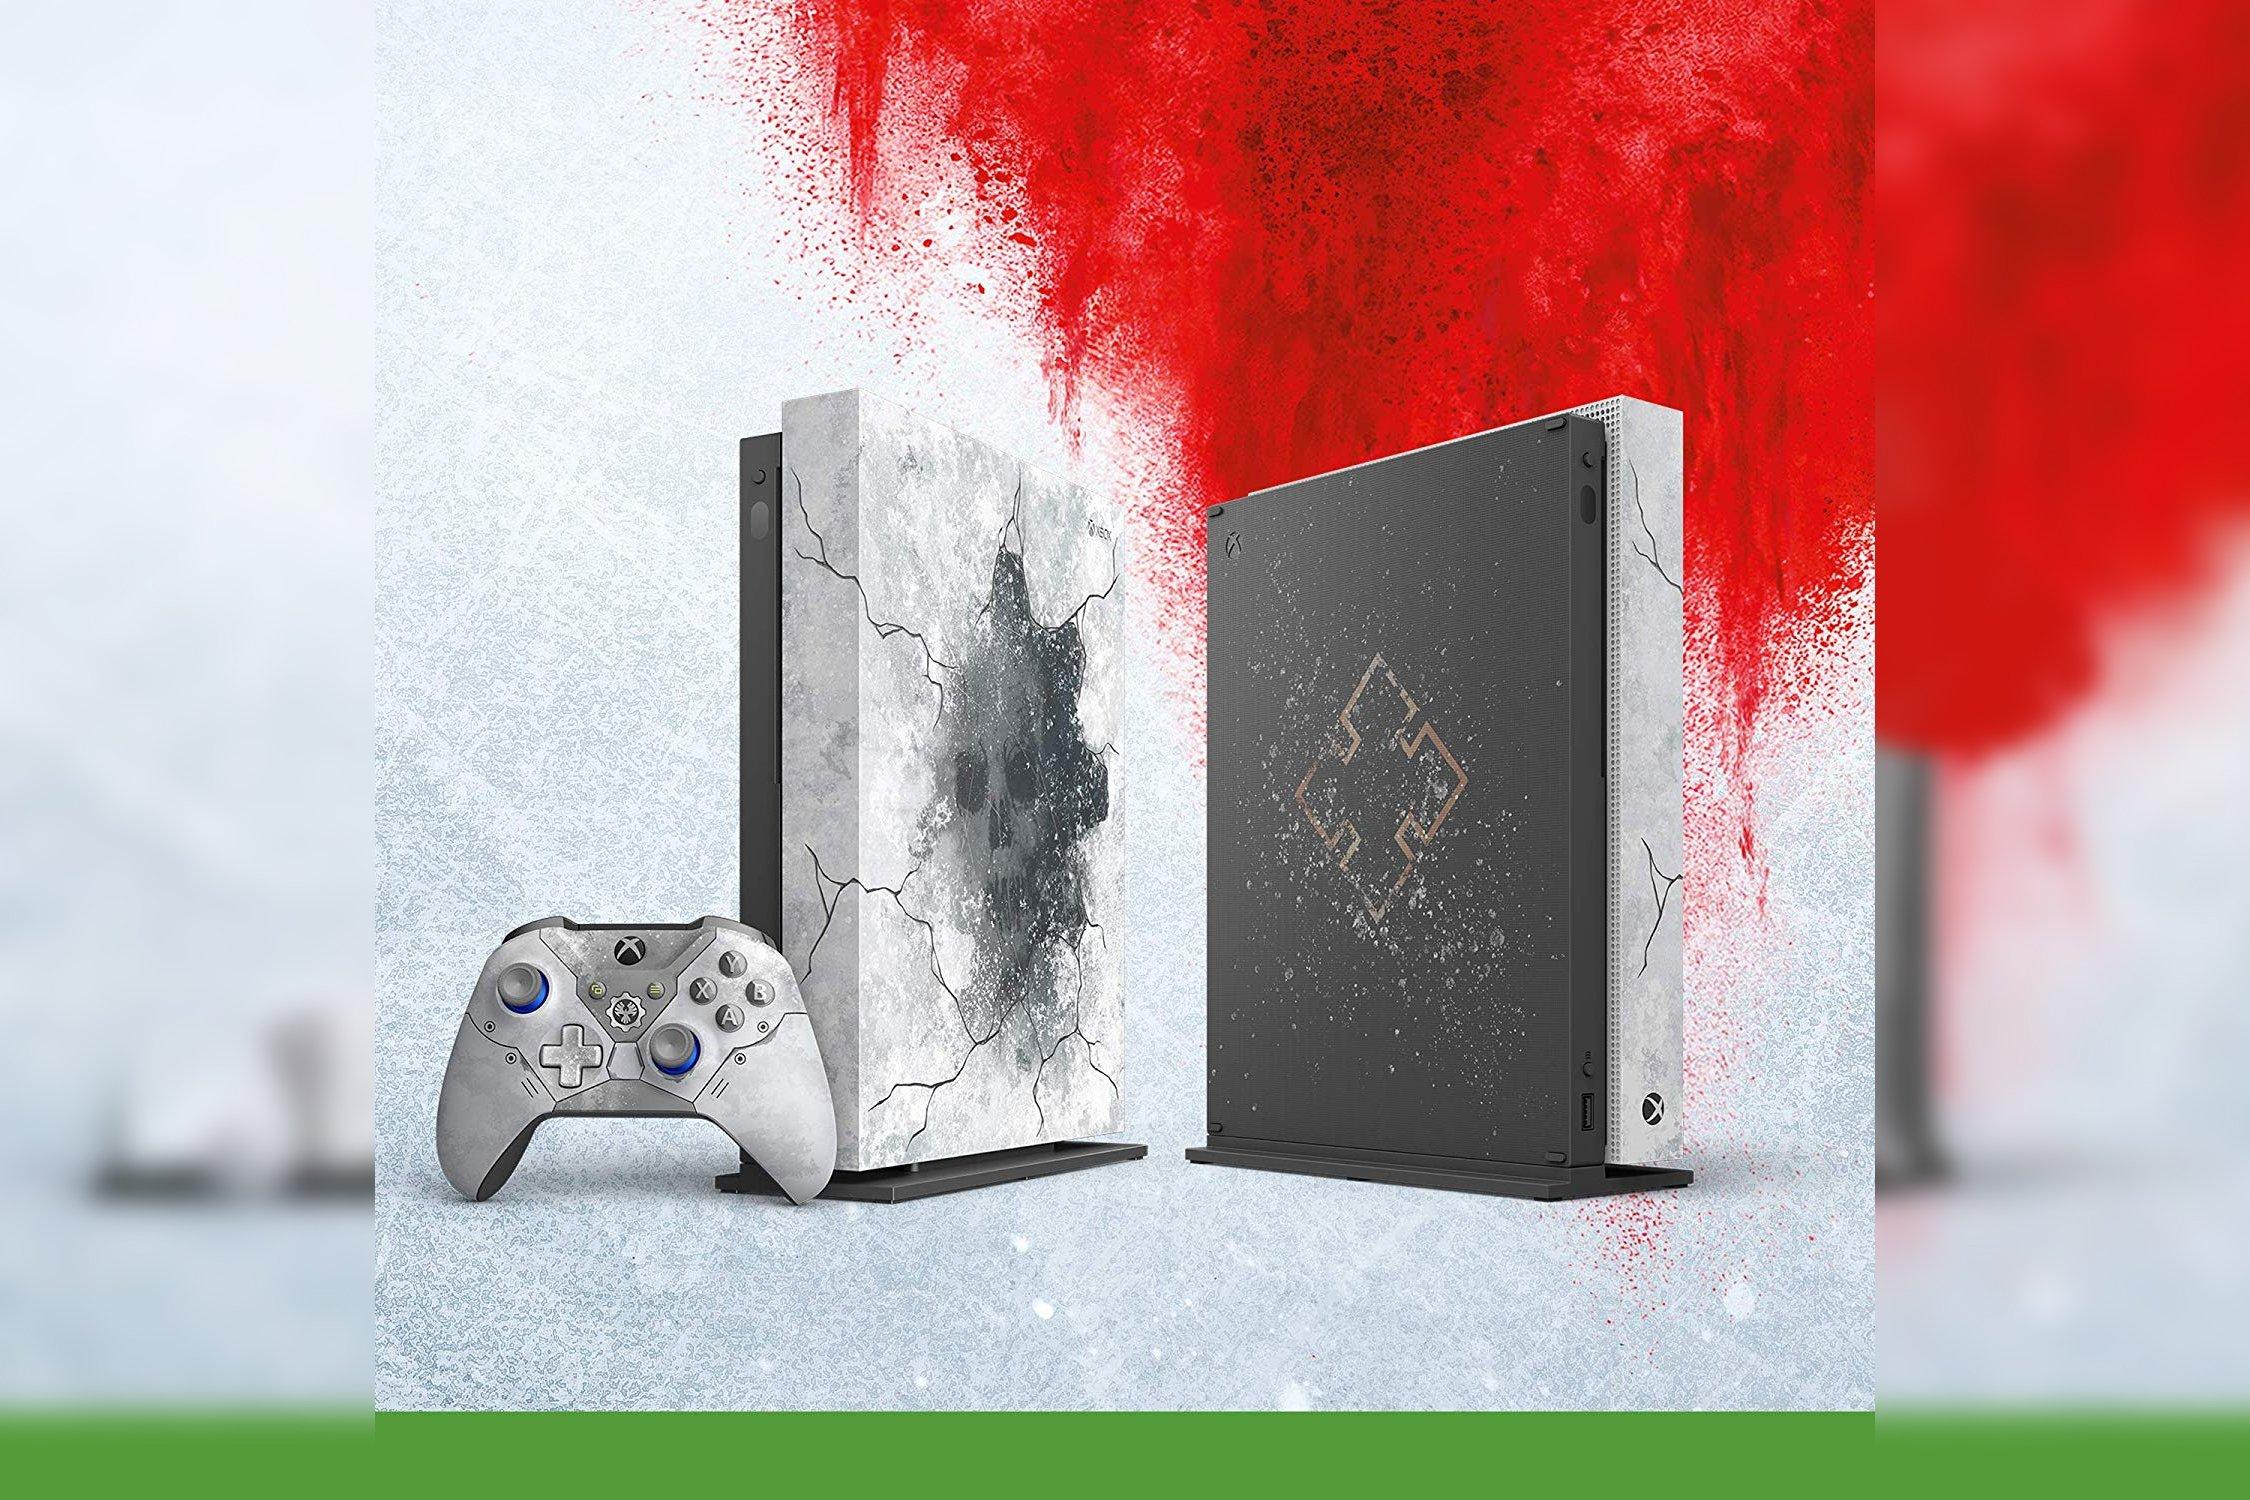 Xbox One X Gears 5 Ultimate Edition inclut tous les jeux.